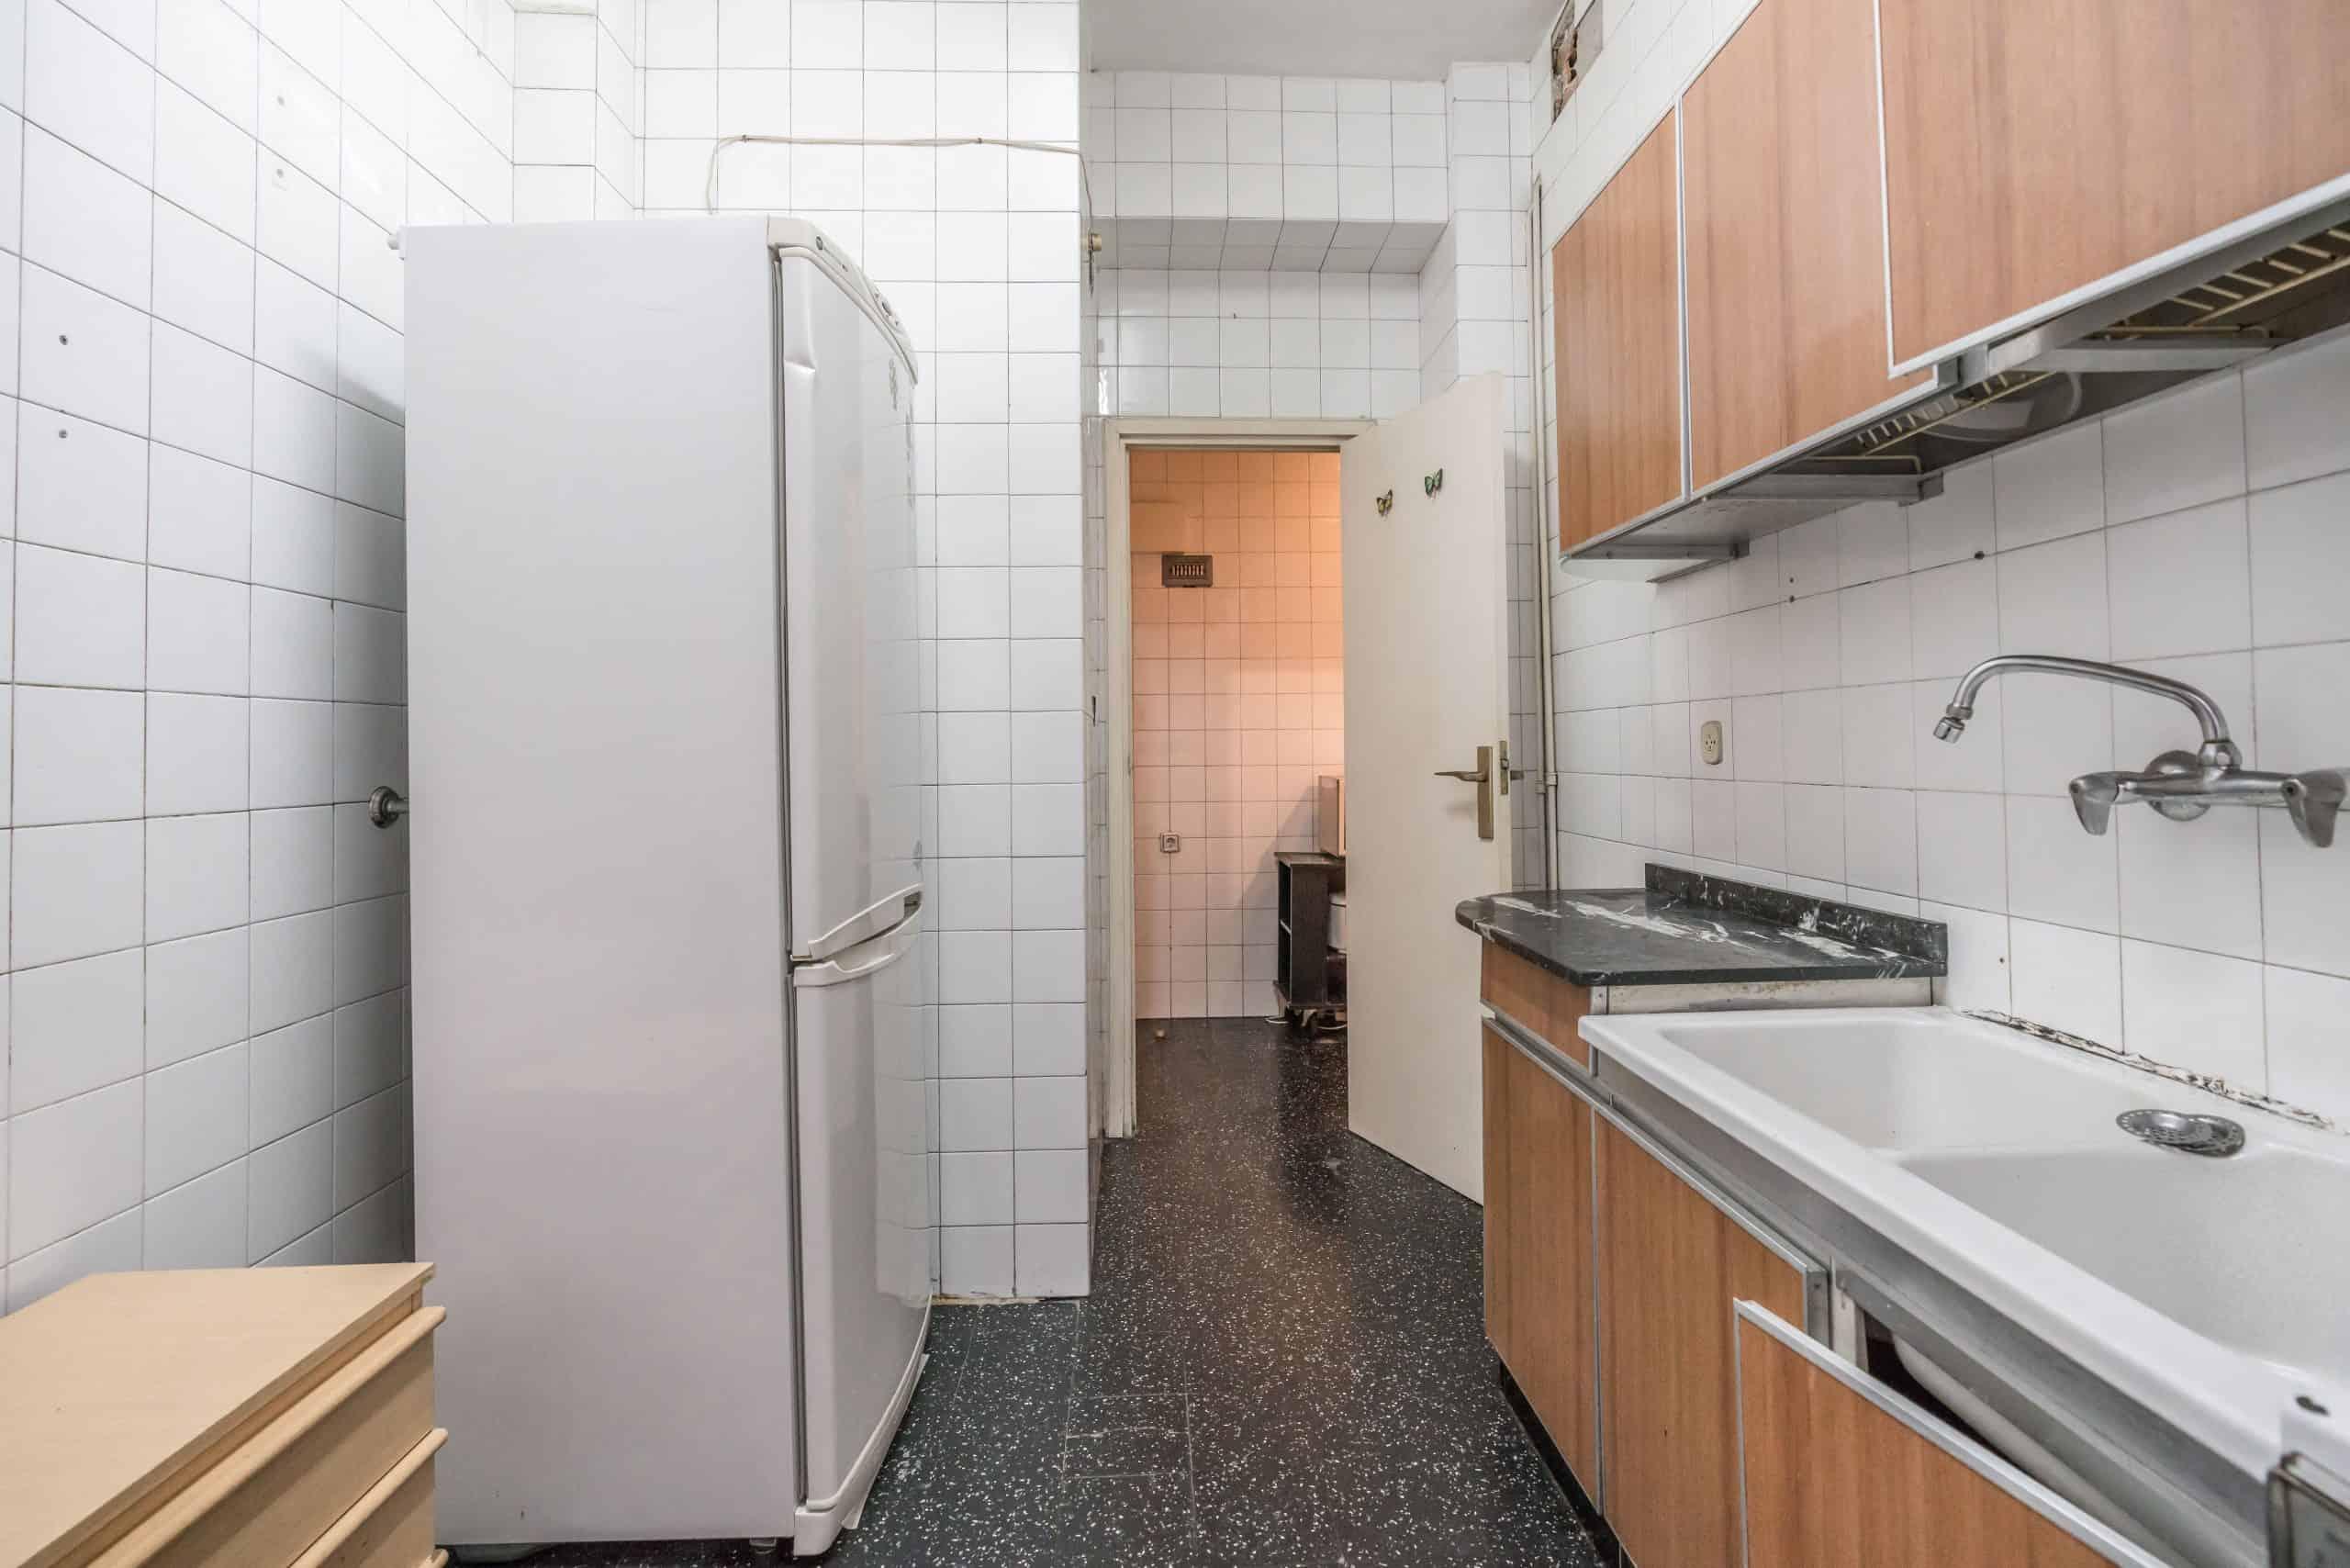 Agencia Inmobiliaria de Madrid-FUTUROCASA-Zona ARGANZUELA-EMBAJADORES-LEGAZPI -calle EMBAJADORES 108-COCINA (6)